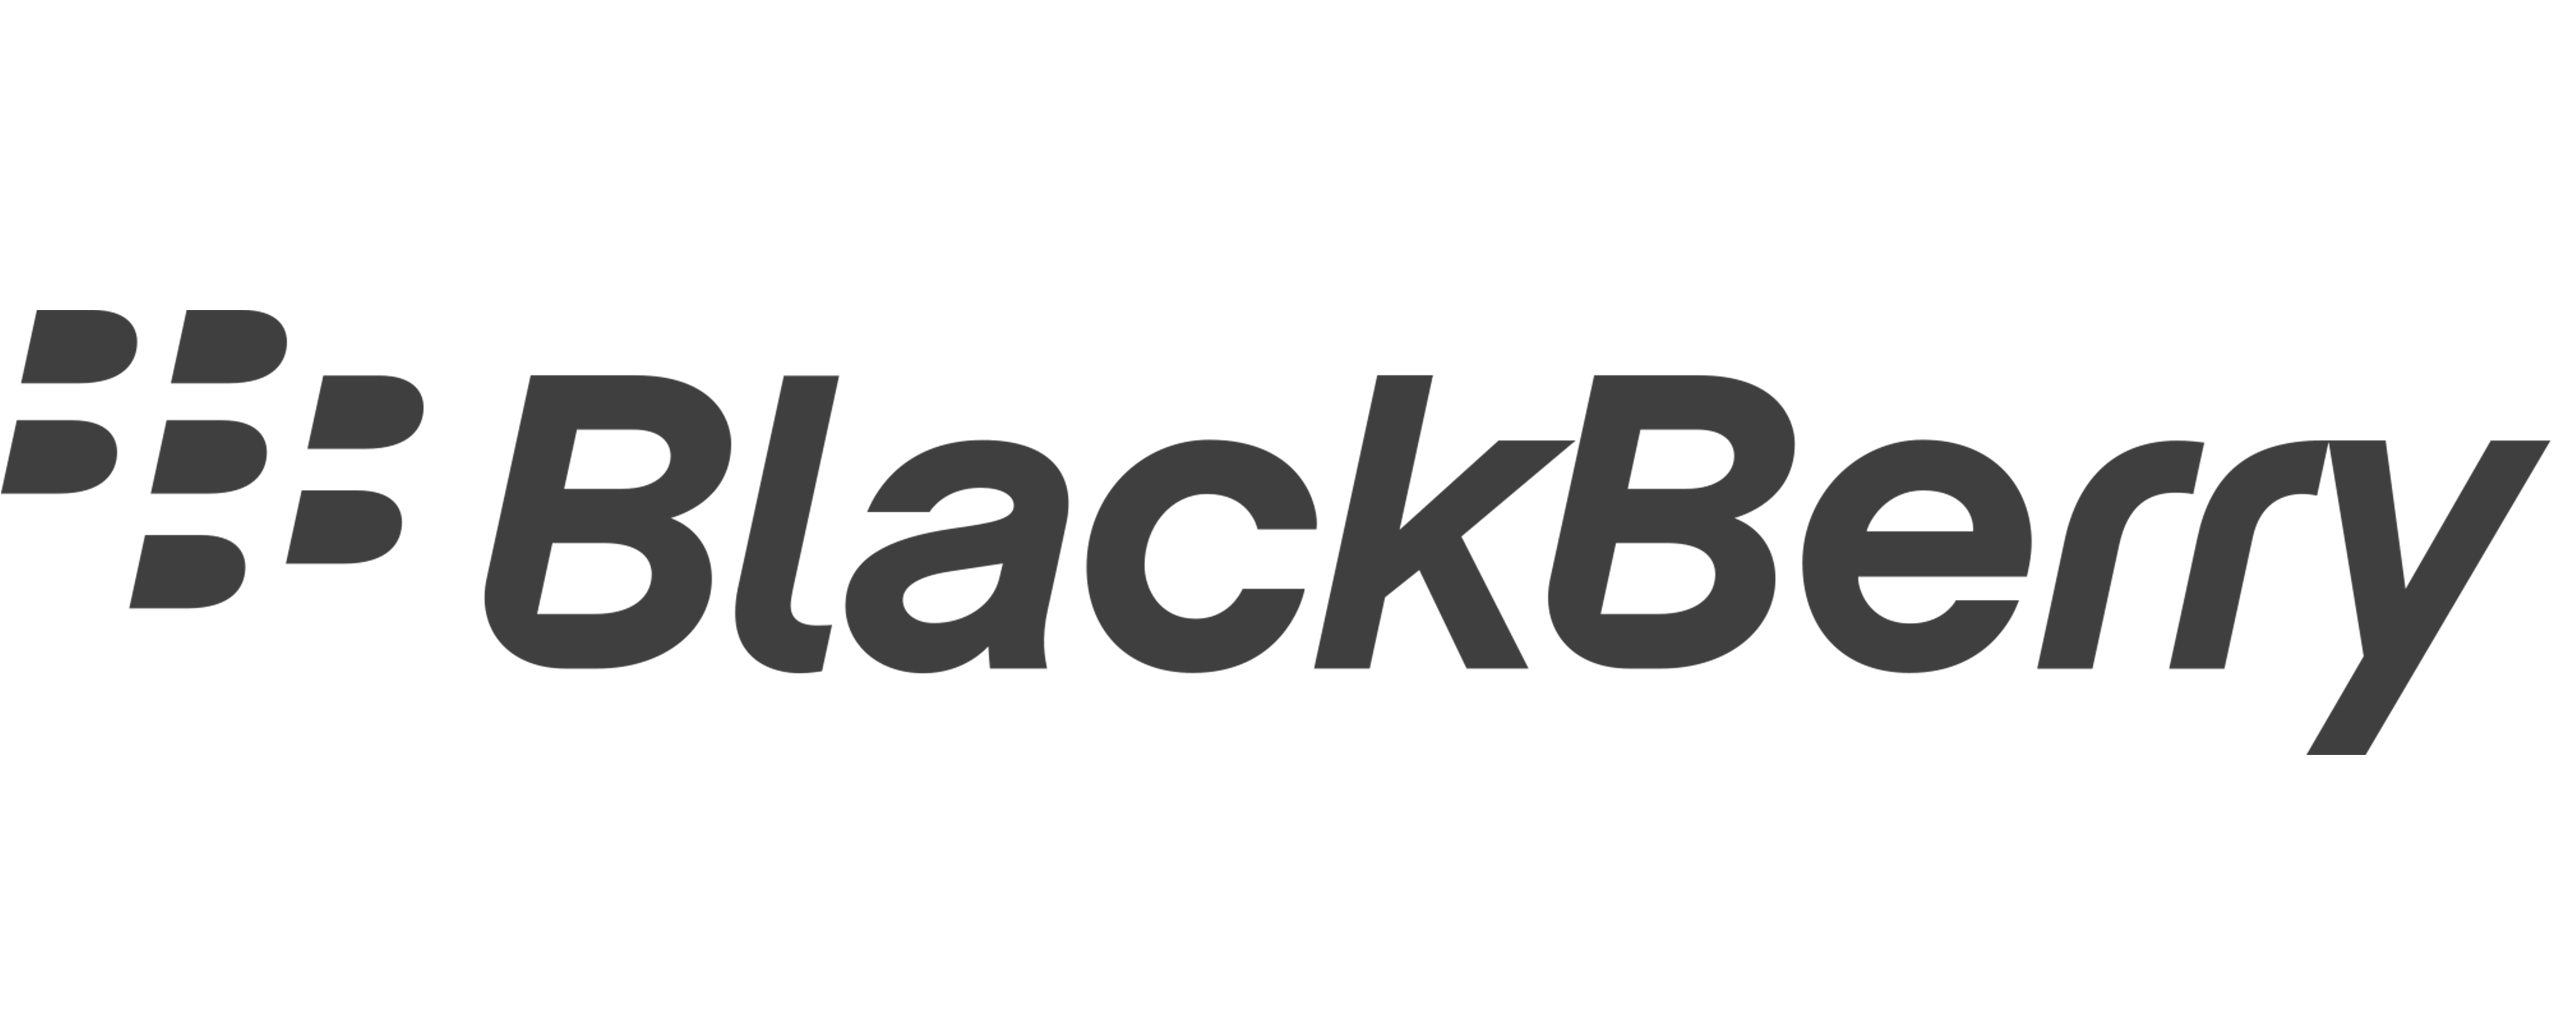 BlackBerry_logo.png